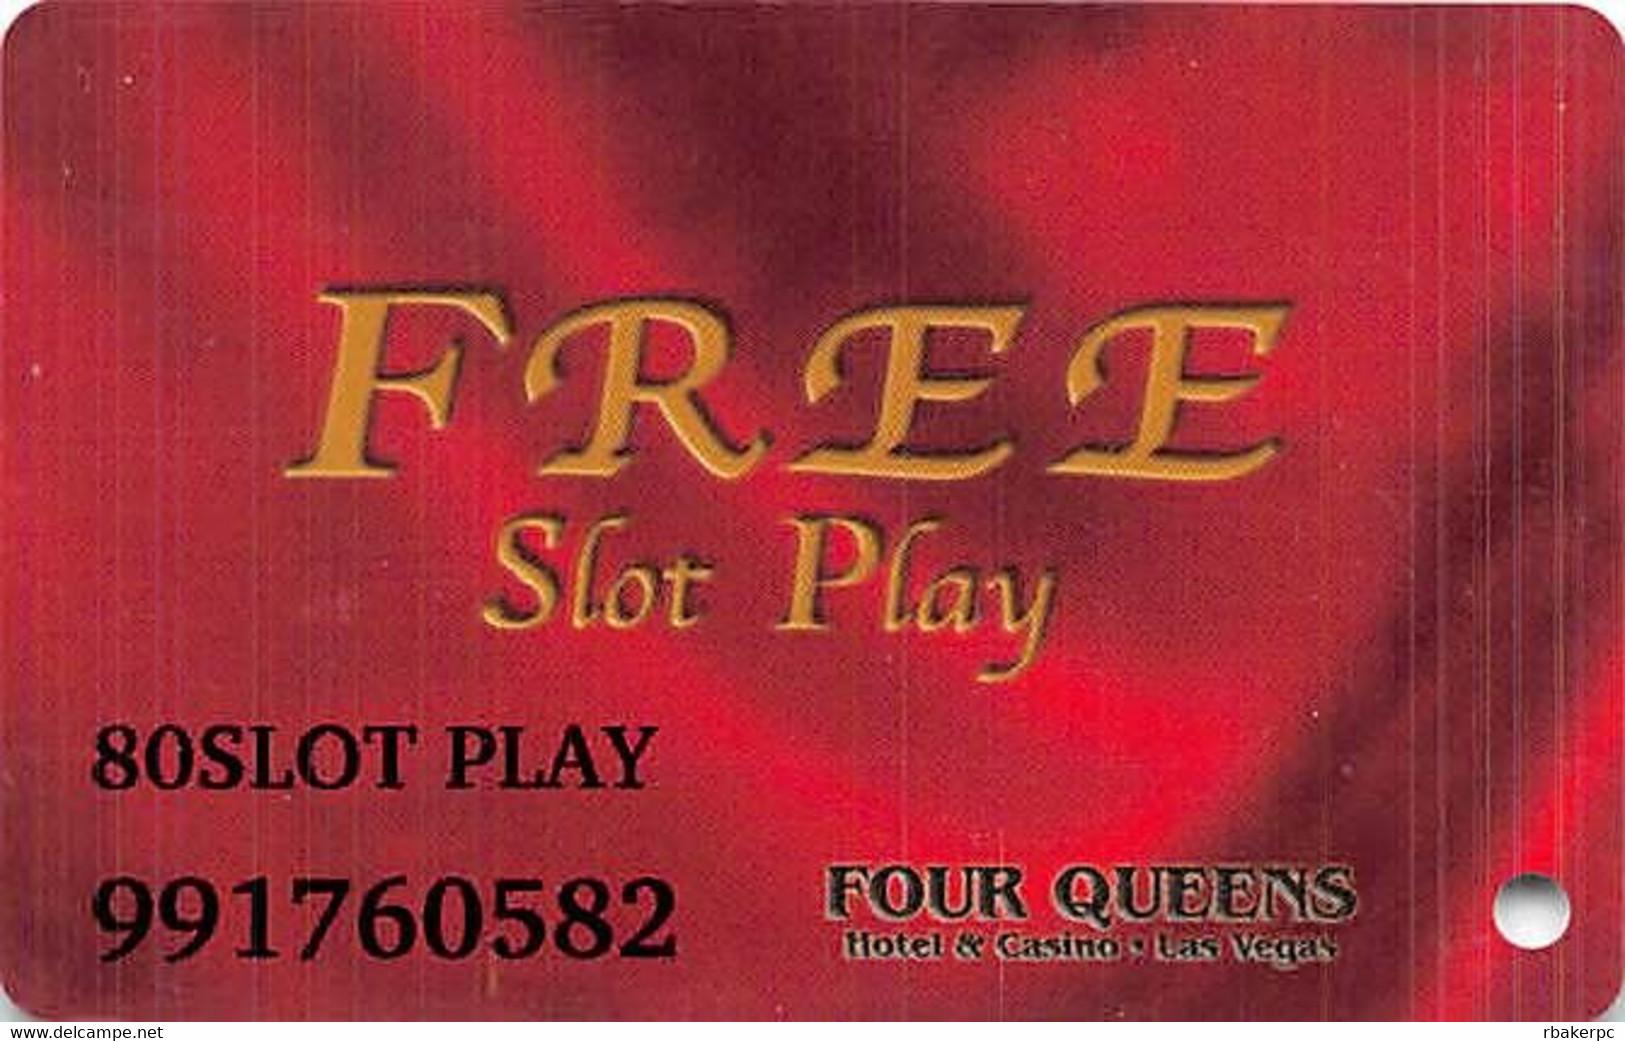 Four Queens Casino Las Vegas, NV - $80 Slot Play Card - ACC Over Mag Stripe - Casino Cards